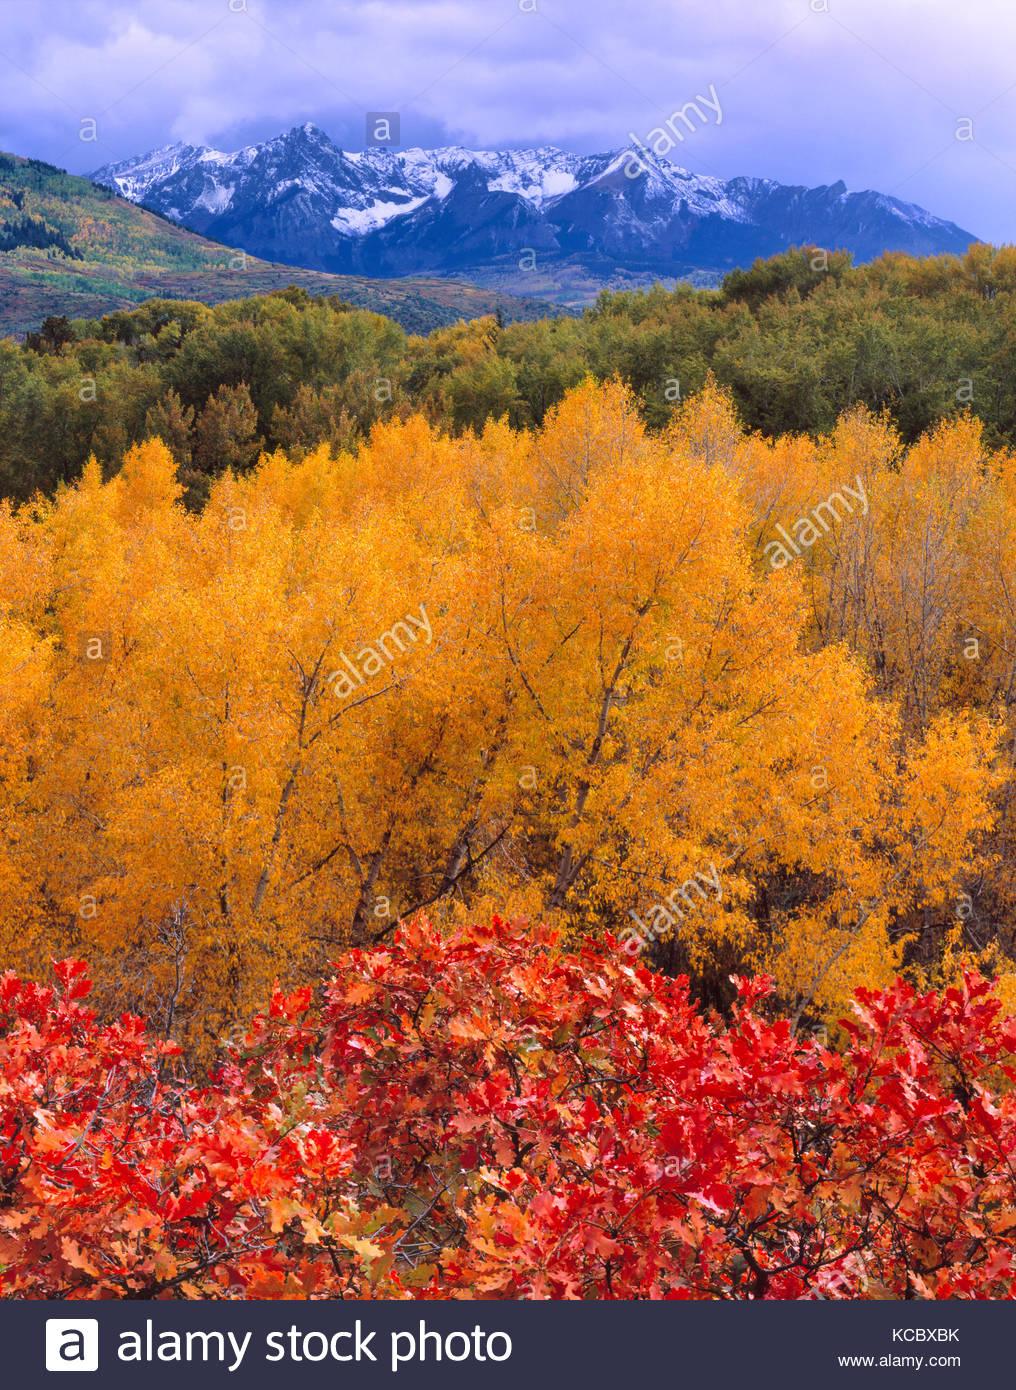 Gamble Oak, Narrowleaf Cottonwood and the San Juan Range, Uncompahgre National Forest, Colorado - Stock Image